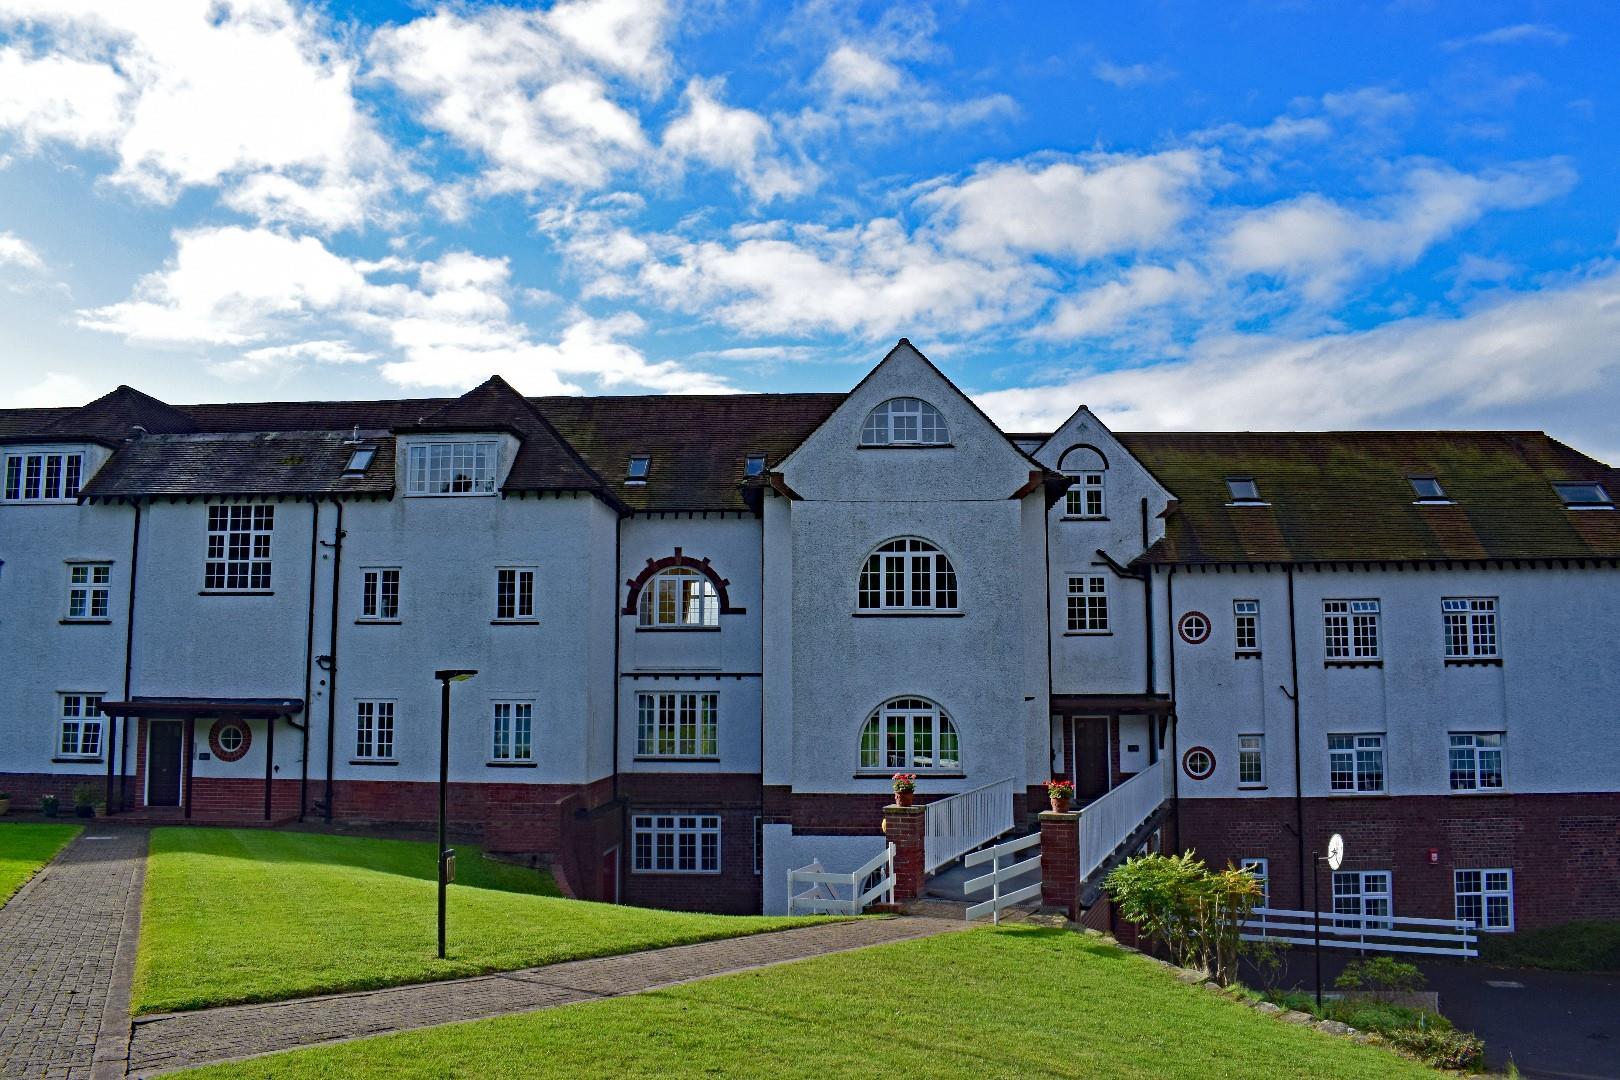 34 Romsley Hill Grange, Farley Lane, Romsley, B62 0LN